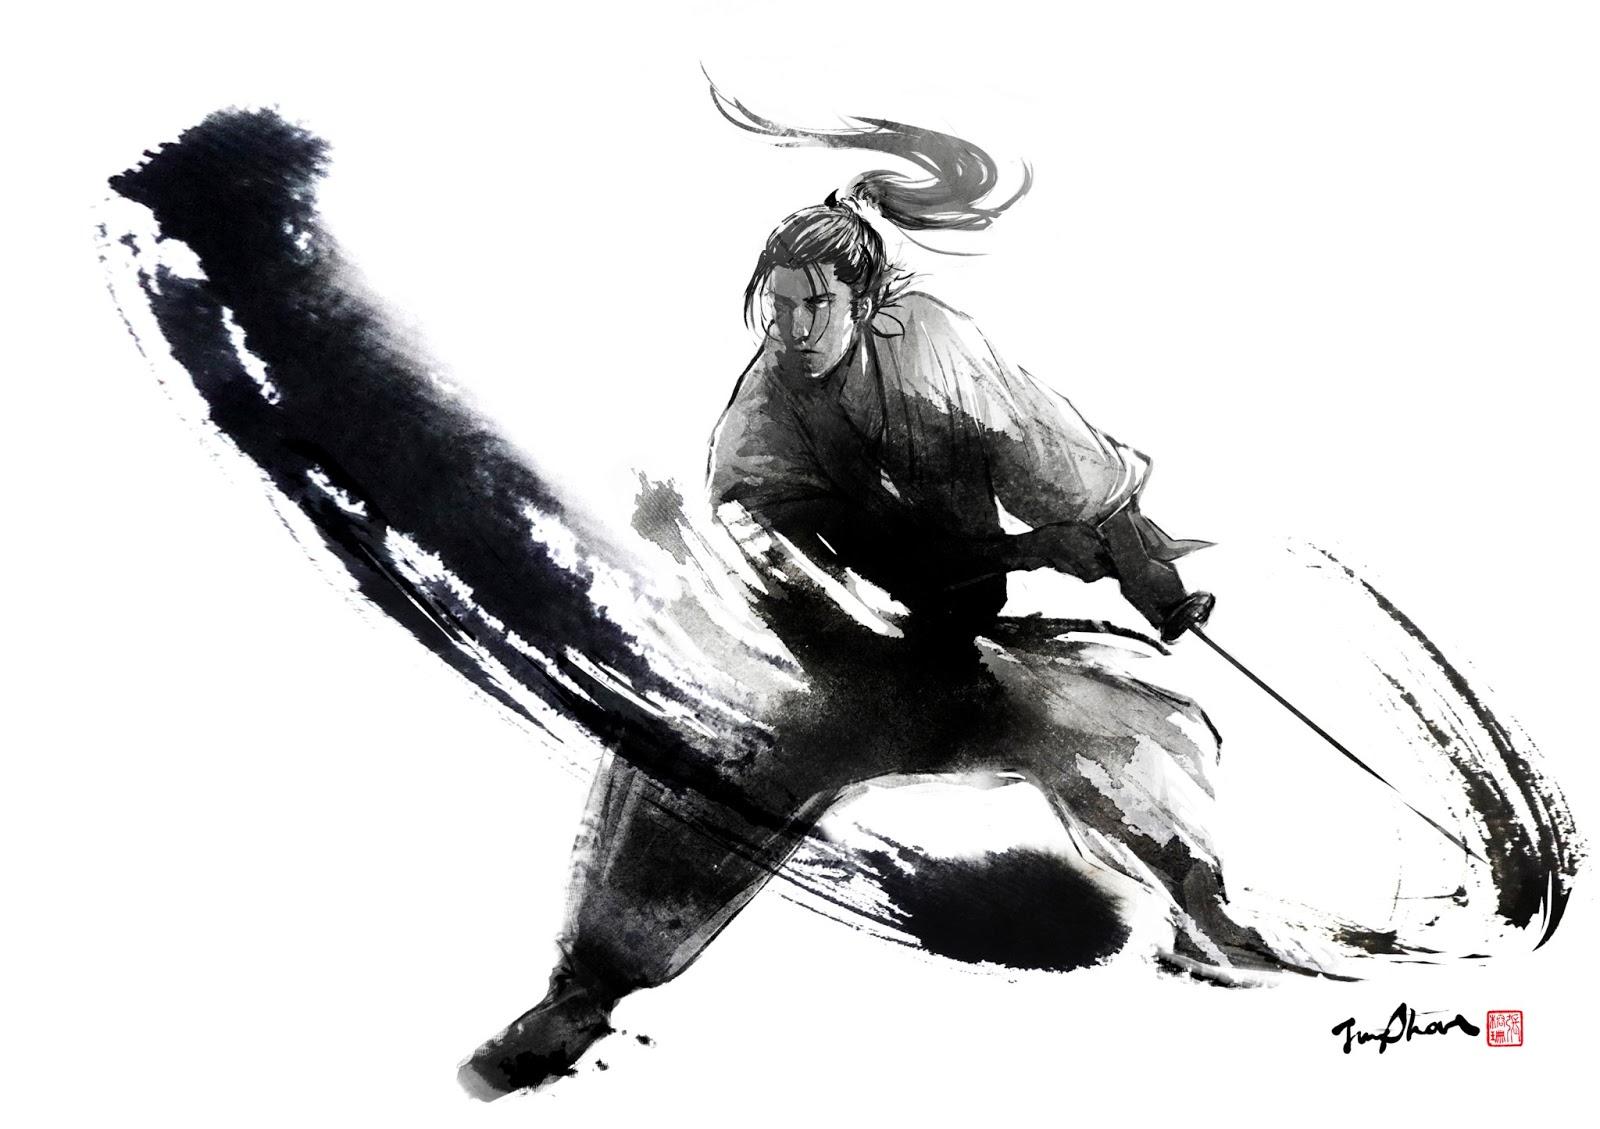 Drawn samurai samurai art Jungshan Samurai Collection Arts Amazing